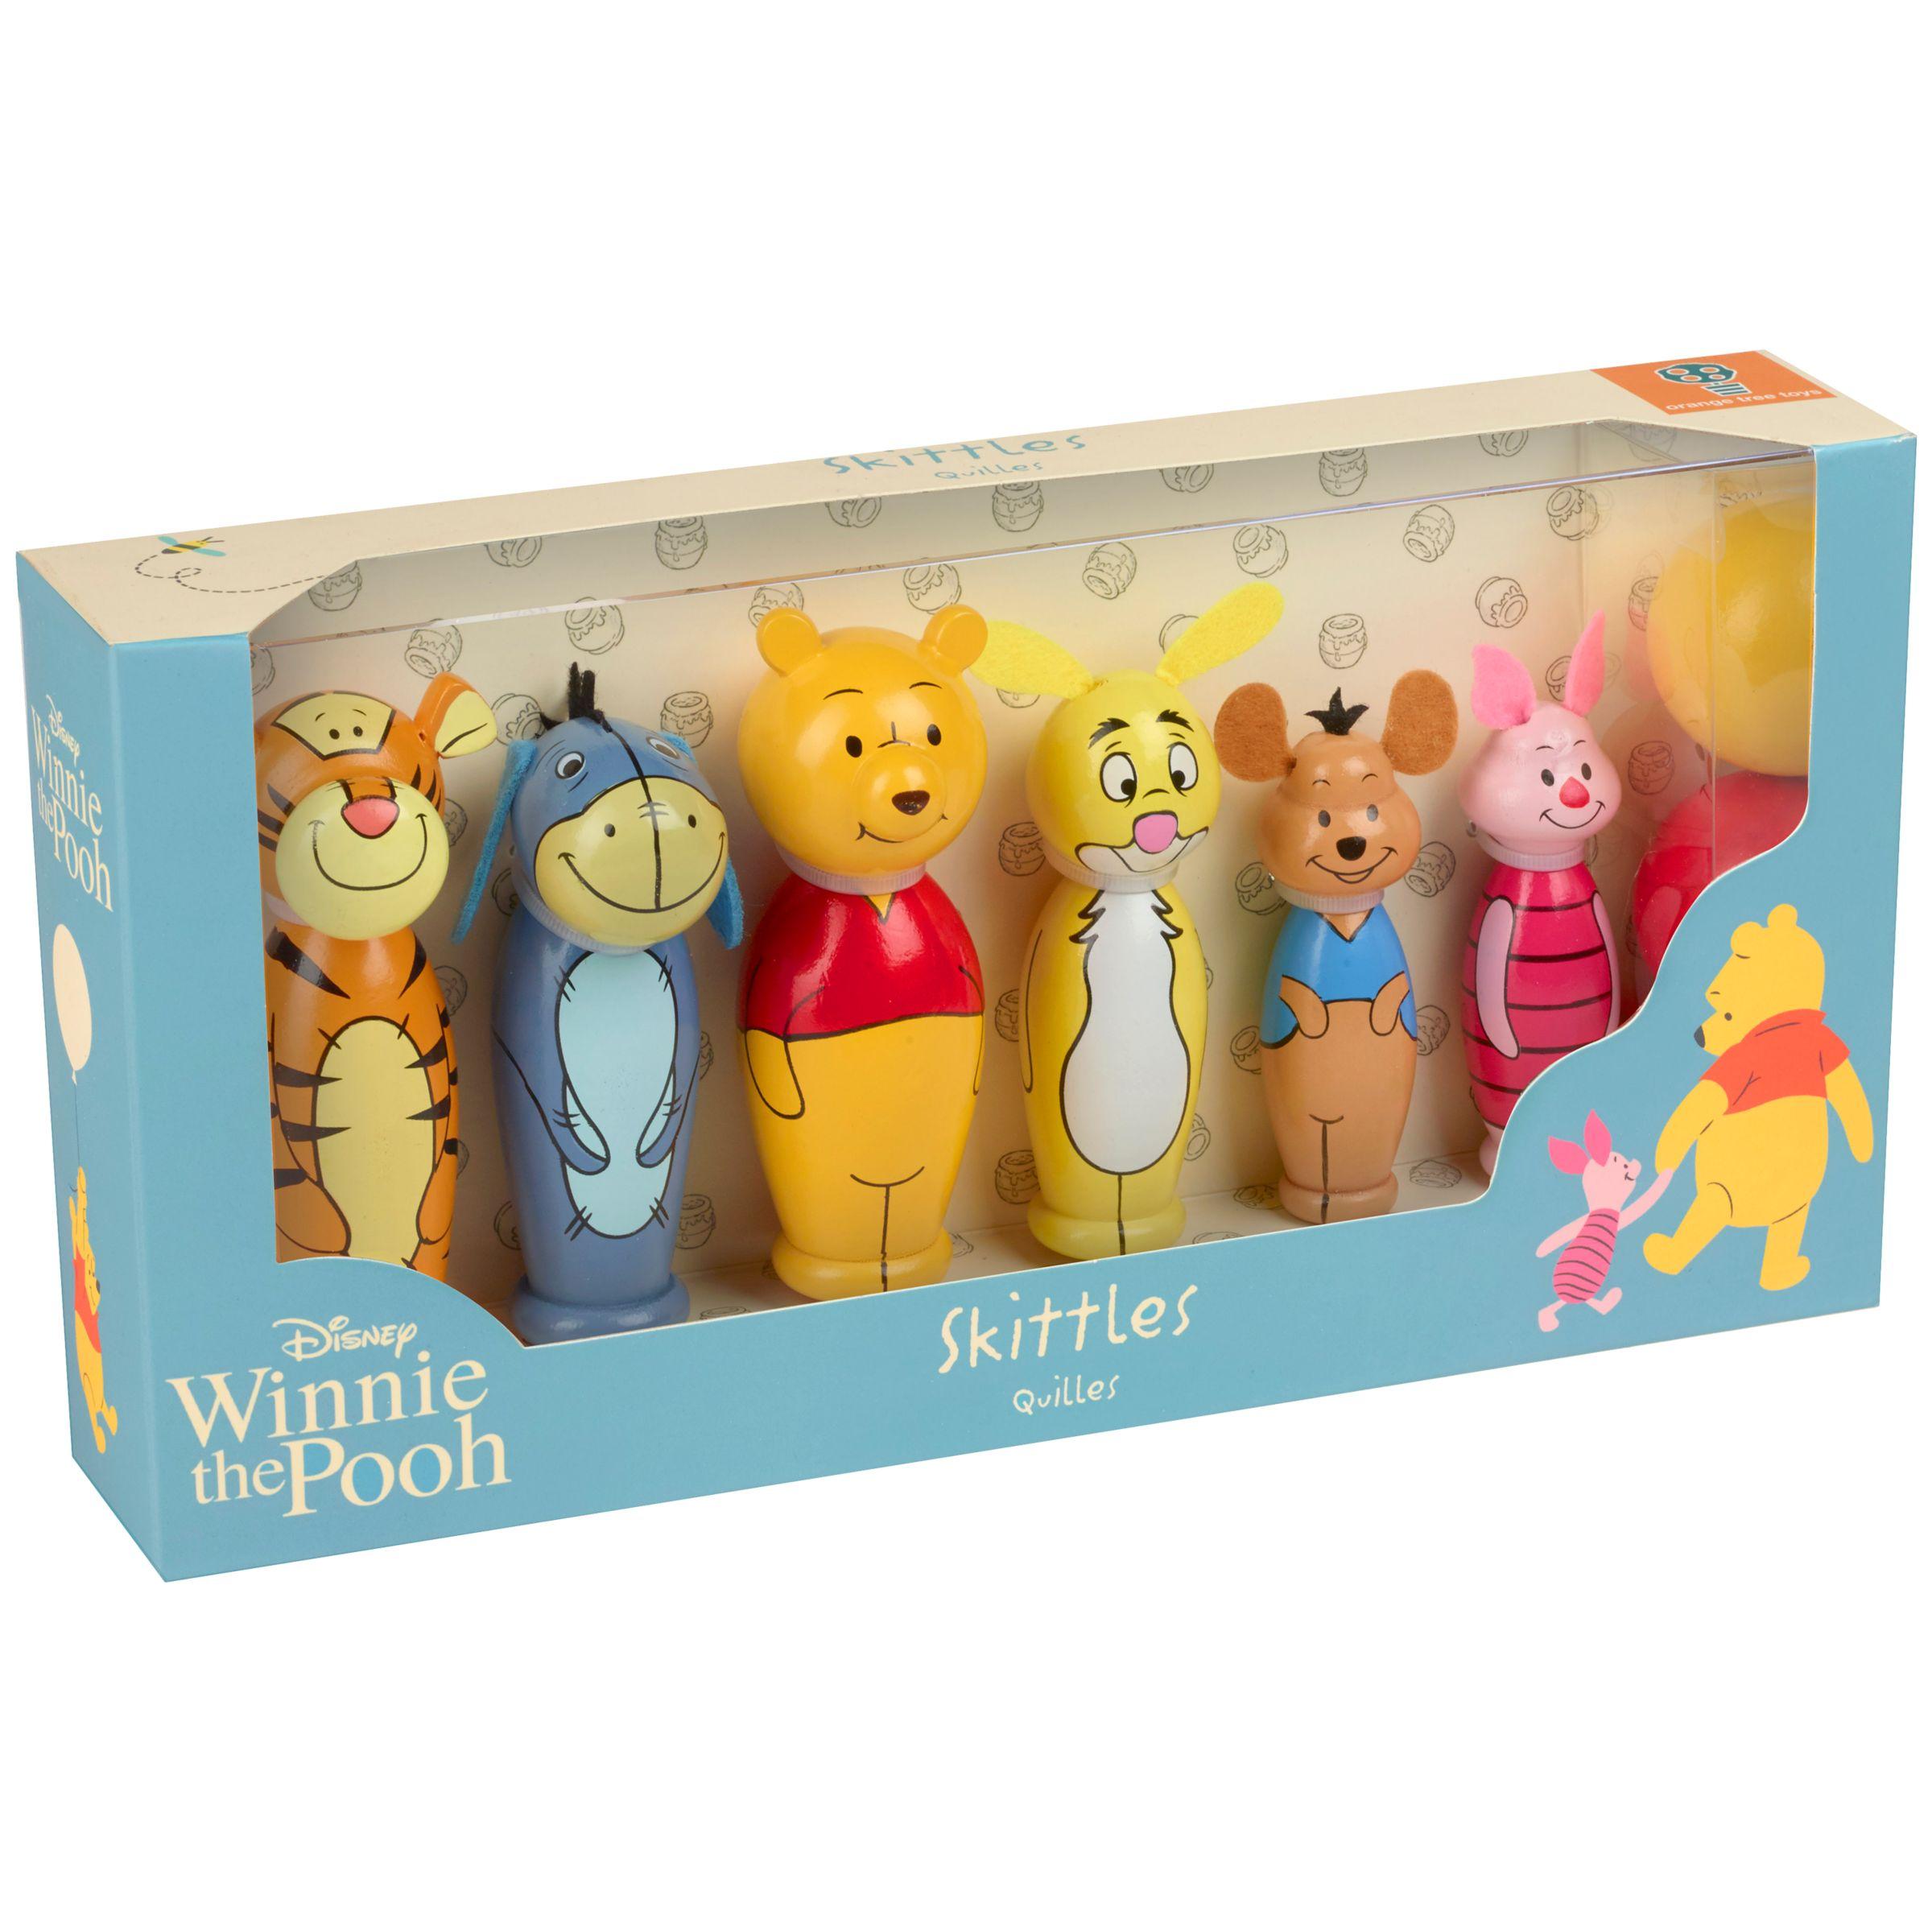 Orange Tree Orange Tree Winnie the Pooh Skittles Wooden Toy